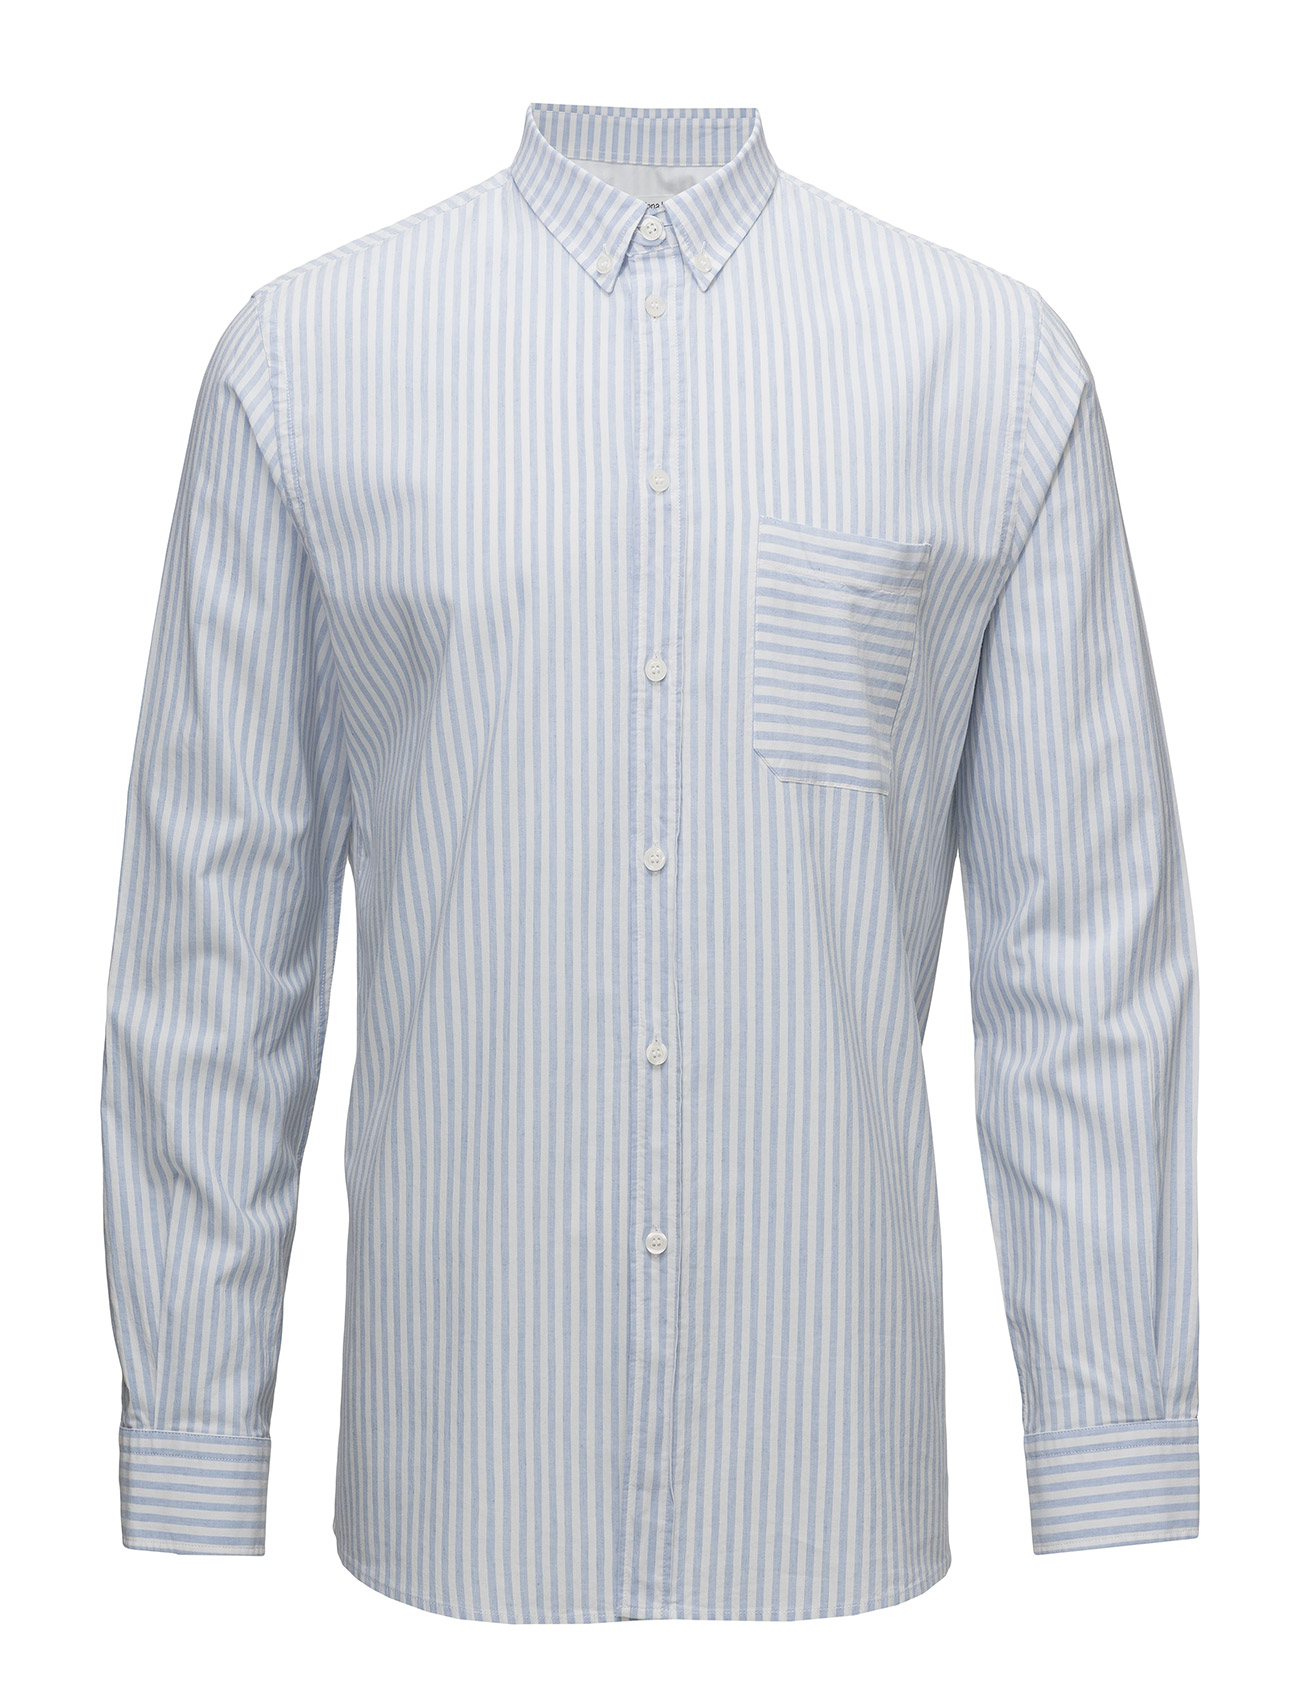 Filippa K M. Peter Striped Shirt